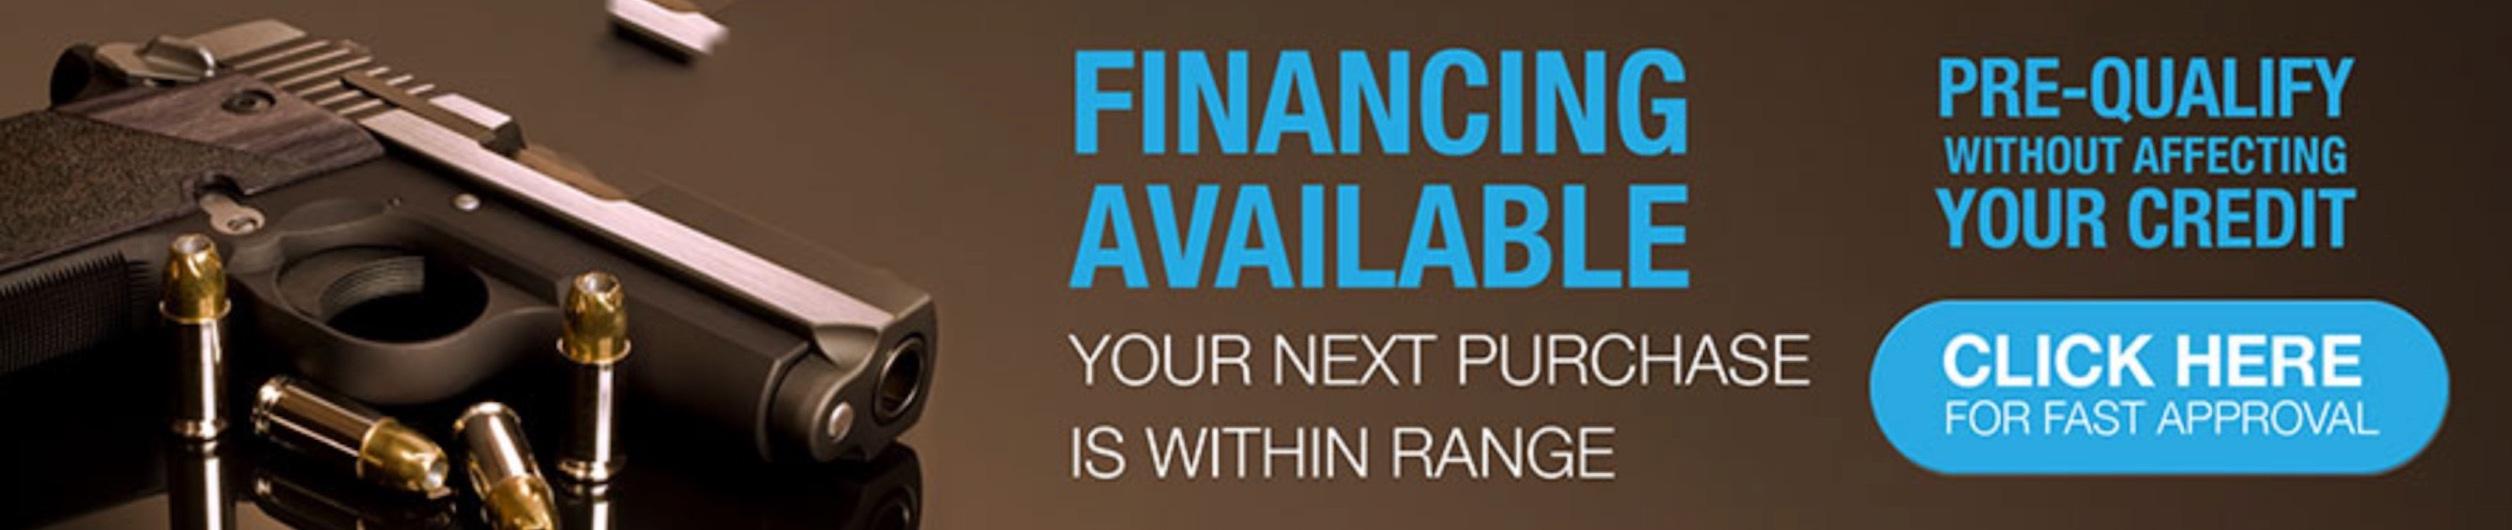 https://fundmycontract.mktplacegateway.com/gateway-pos/fundmycontract/create-loan/CONSUMER_POS?merchant=5f0f4ccaff6a0a090ebbc178&offerCode=5f5277a9ff6a0ad73cb63bc4&pId=5e6a1f846b821f690d4cfa8e&spId=5e6a1f846b821f690d4cfaa0